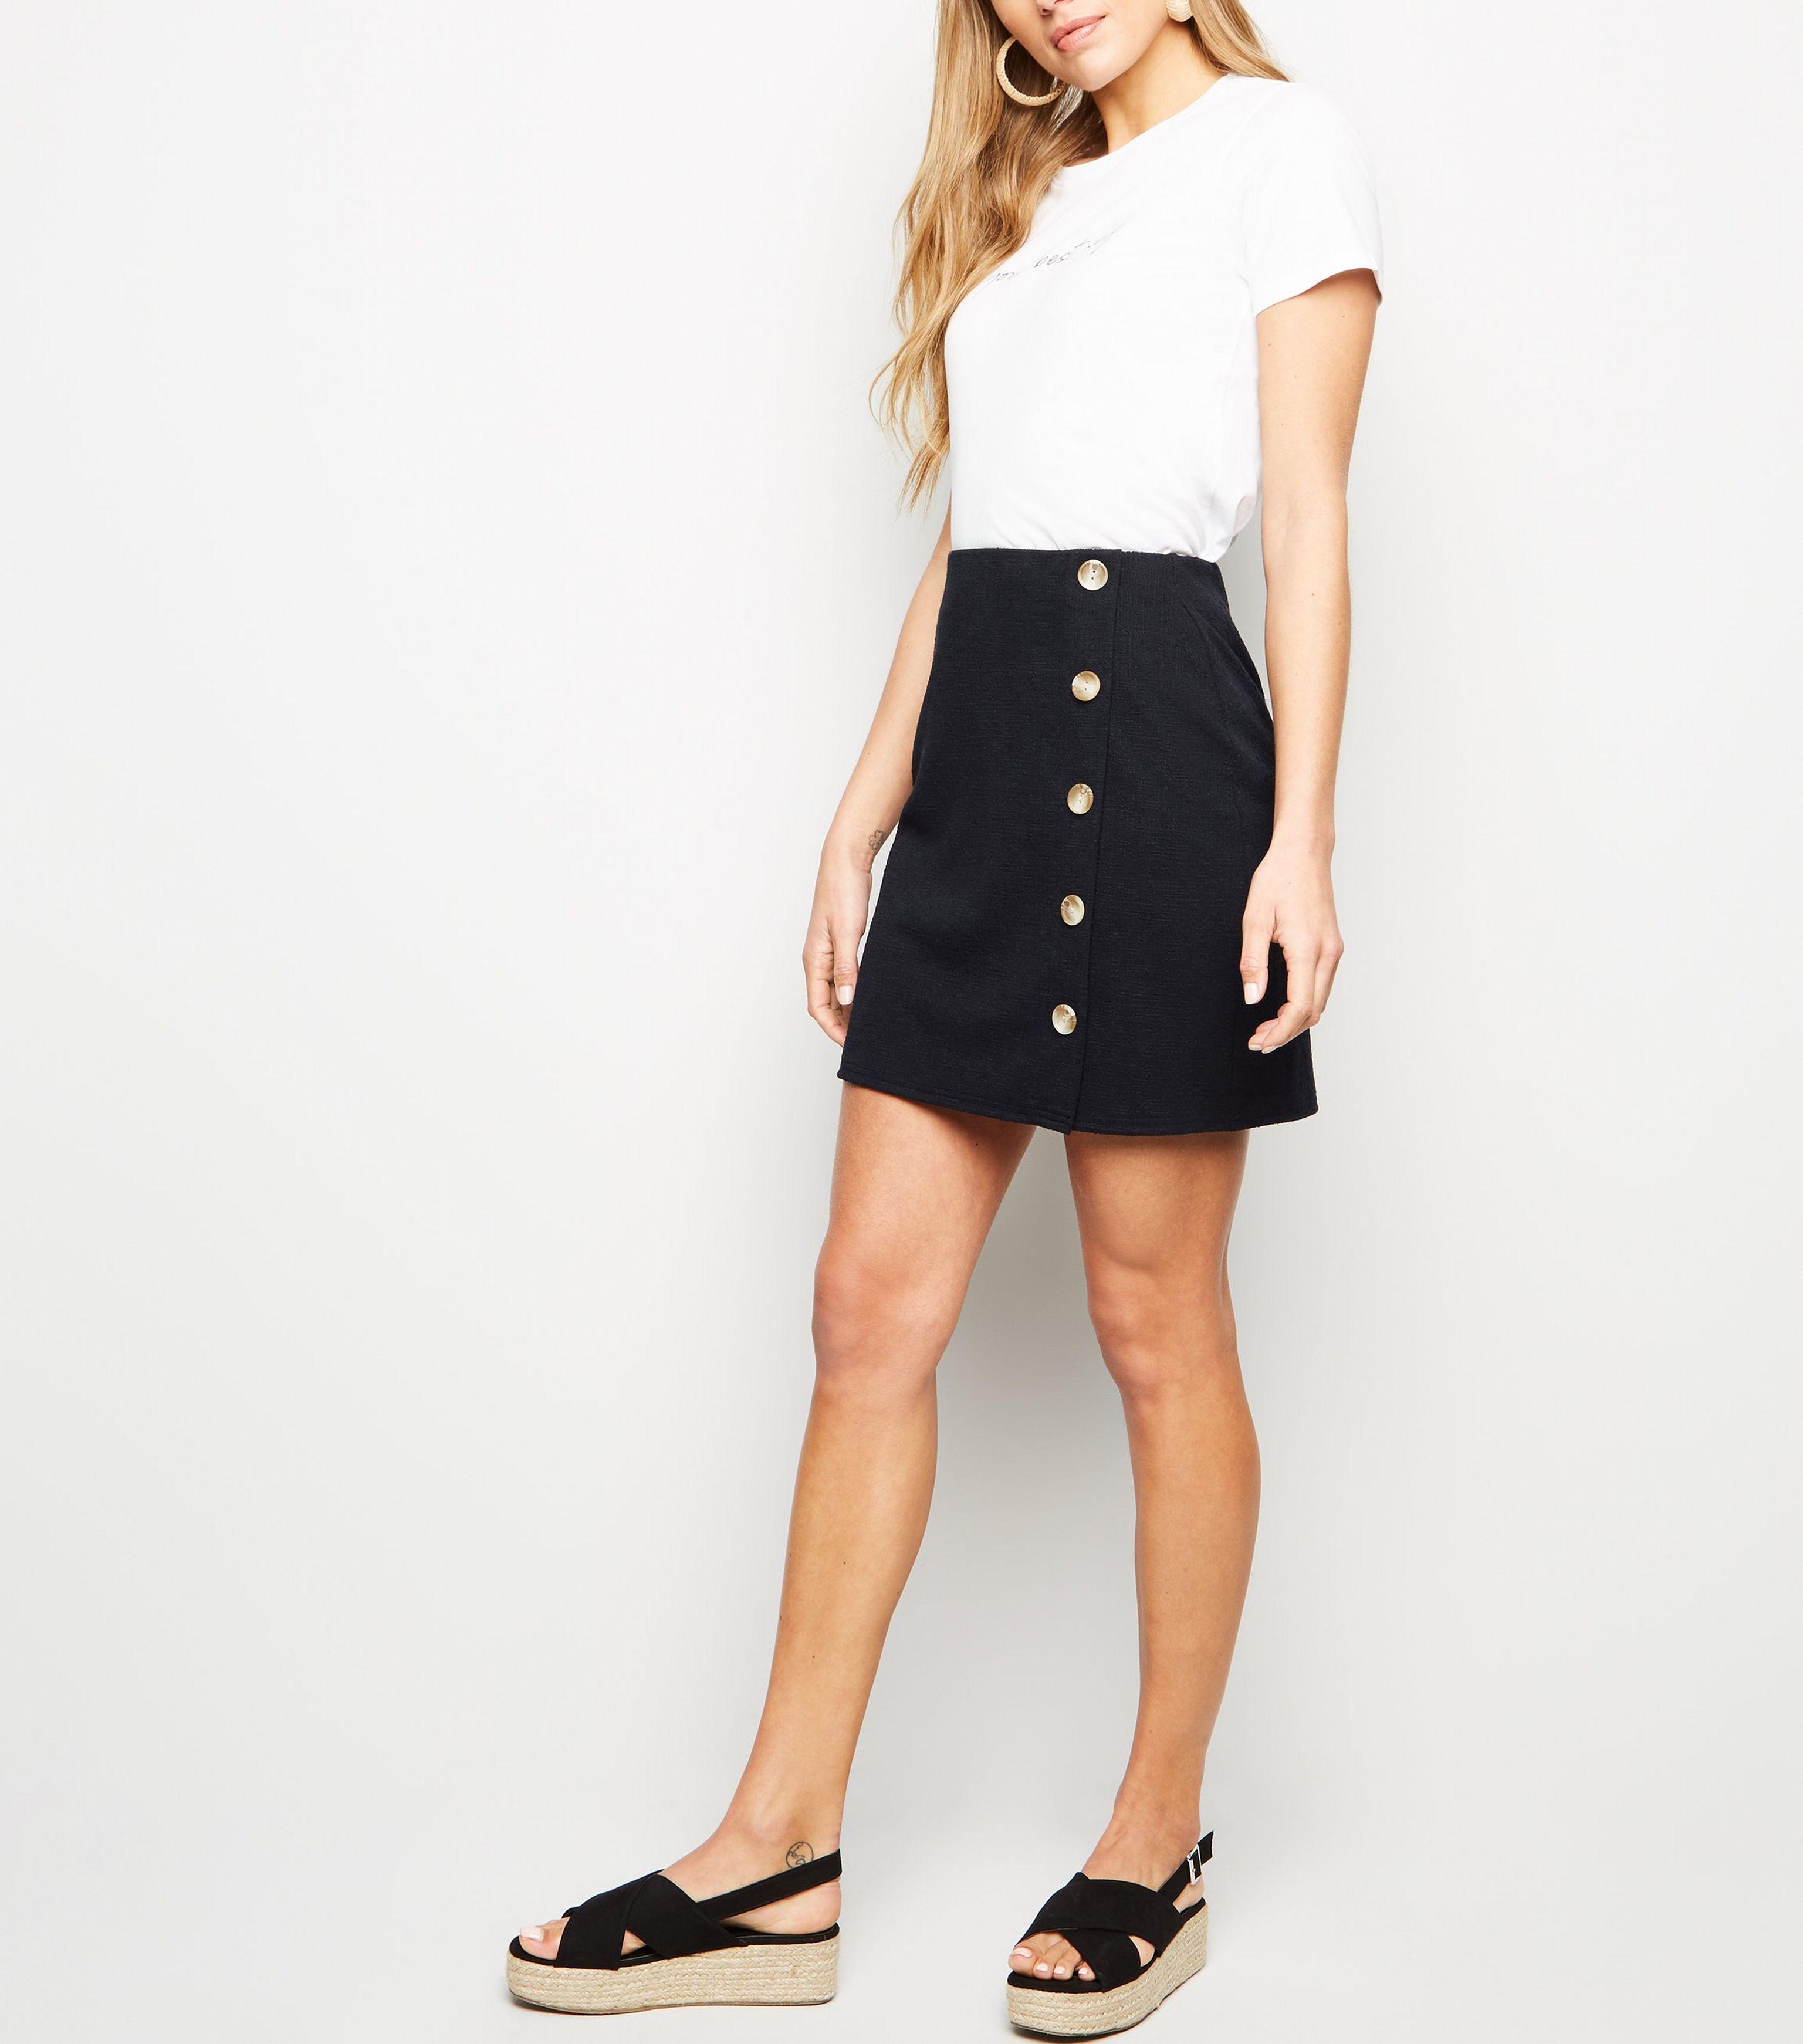 df9ebc6b6 New Look Black Crosshatch Side Button Mini Skirt in Black - Save 42 ...